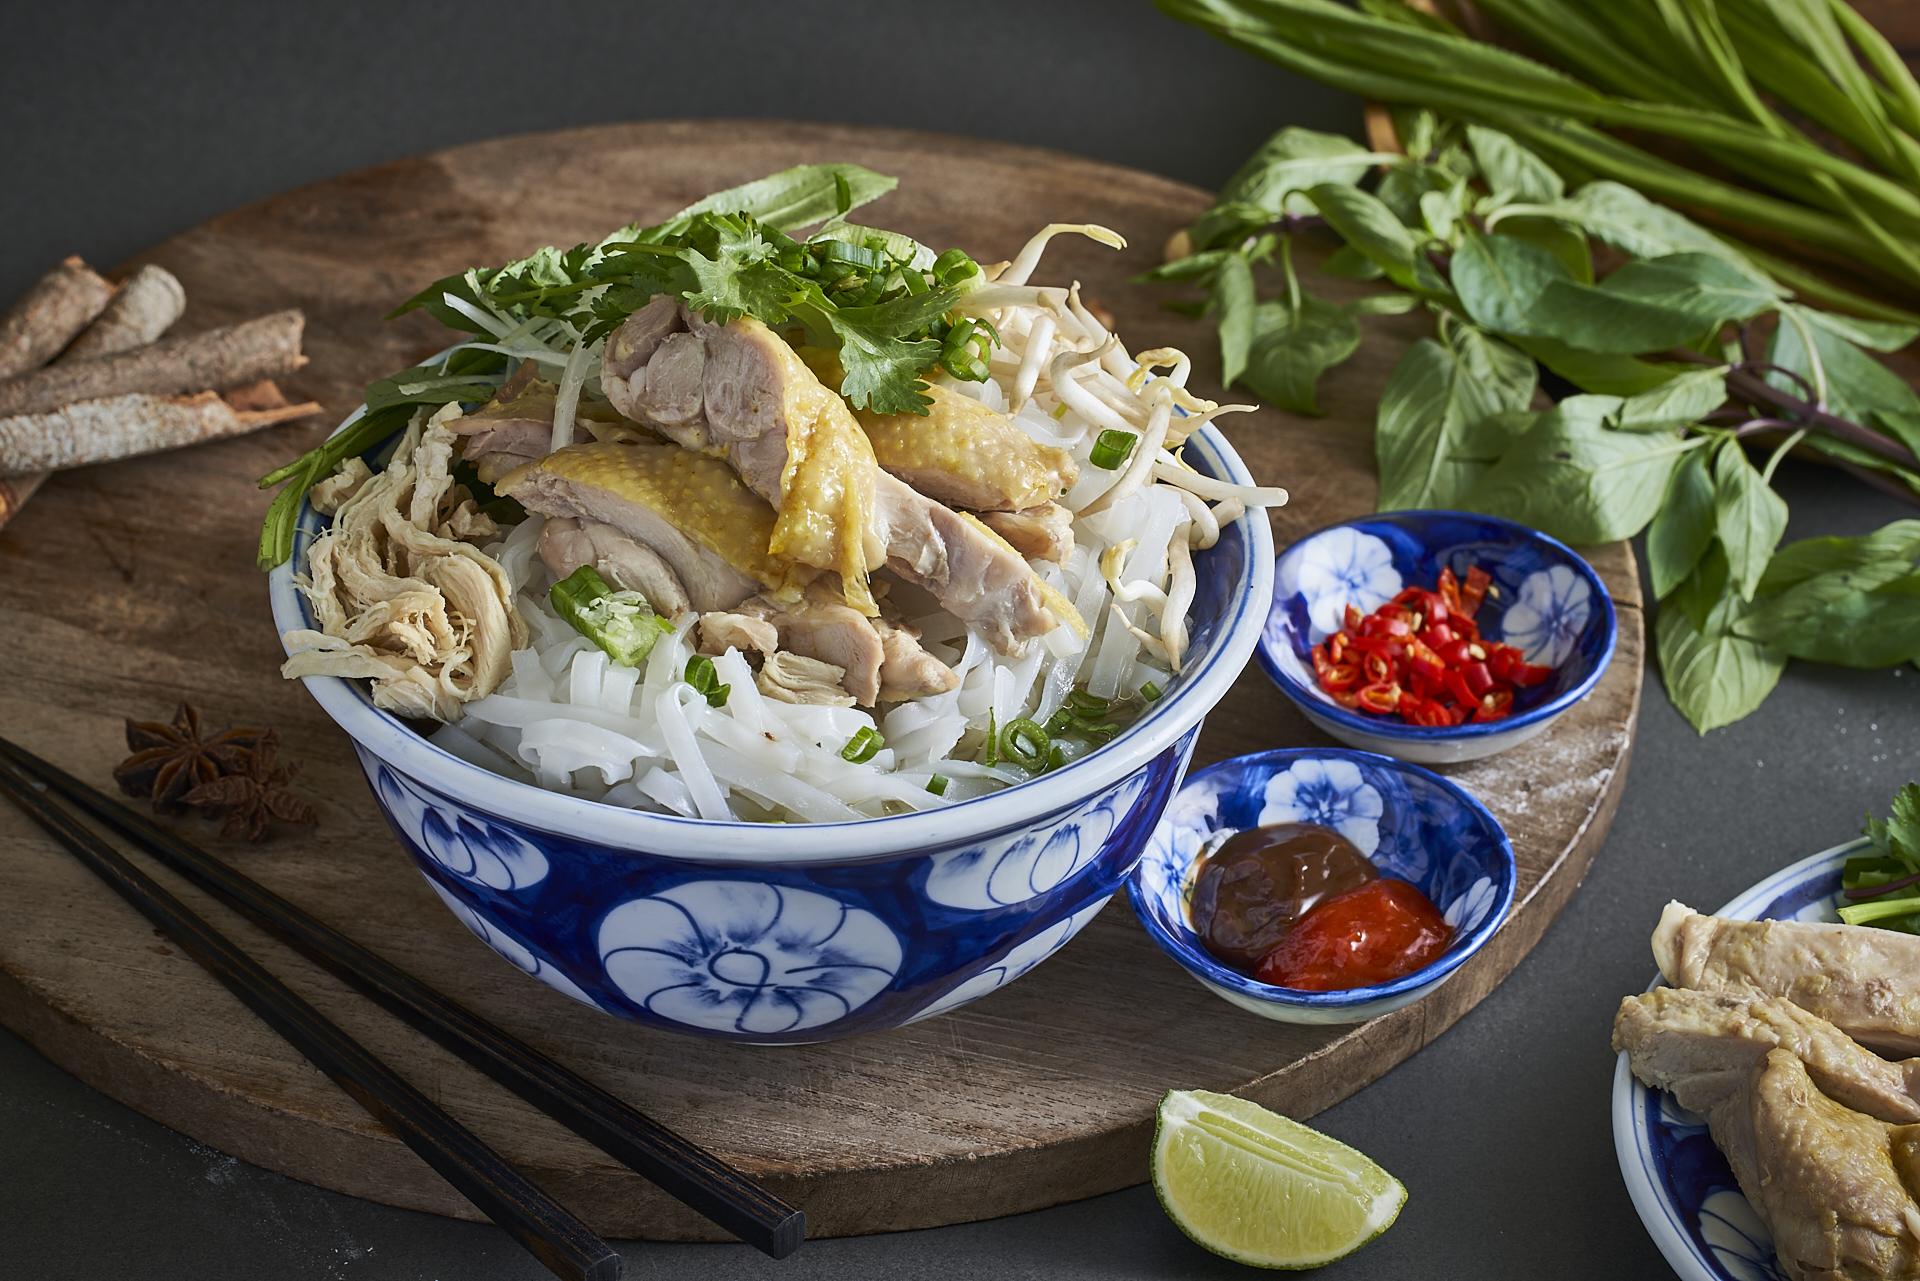 Food-Photography-Singapore-Co-Chung_4